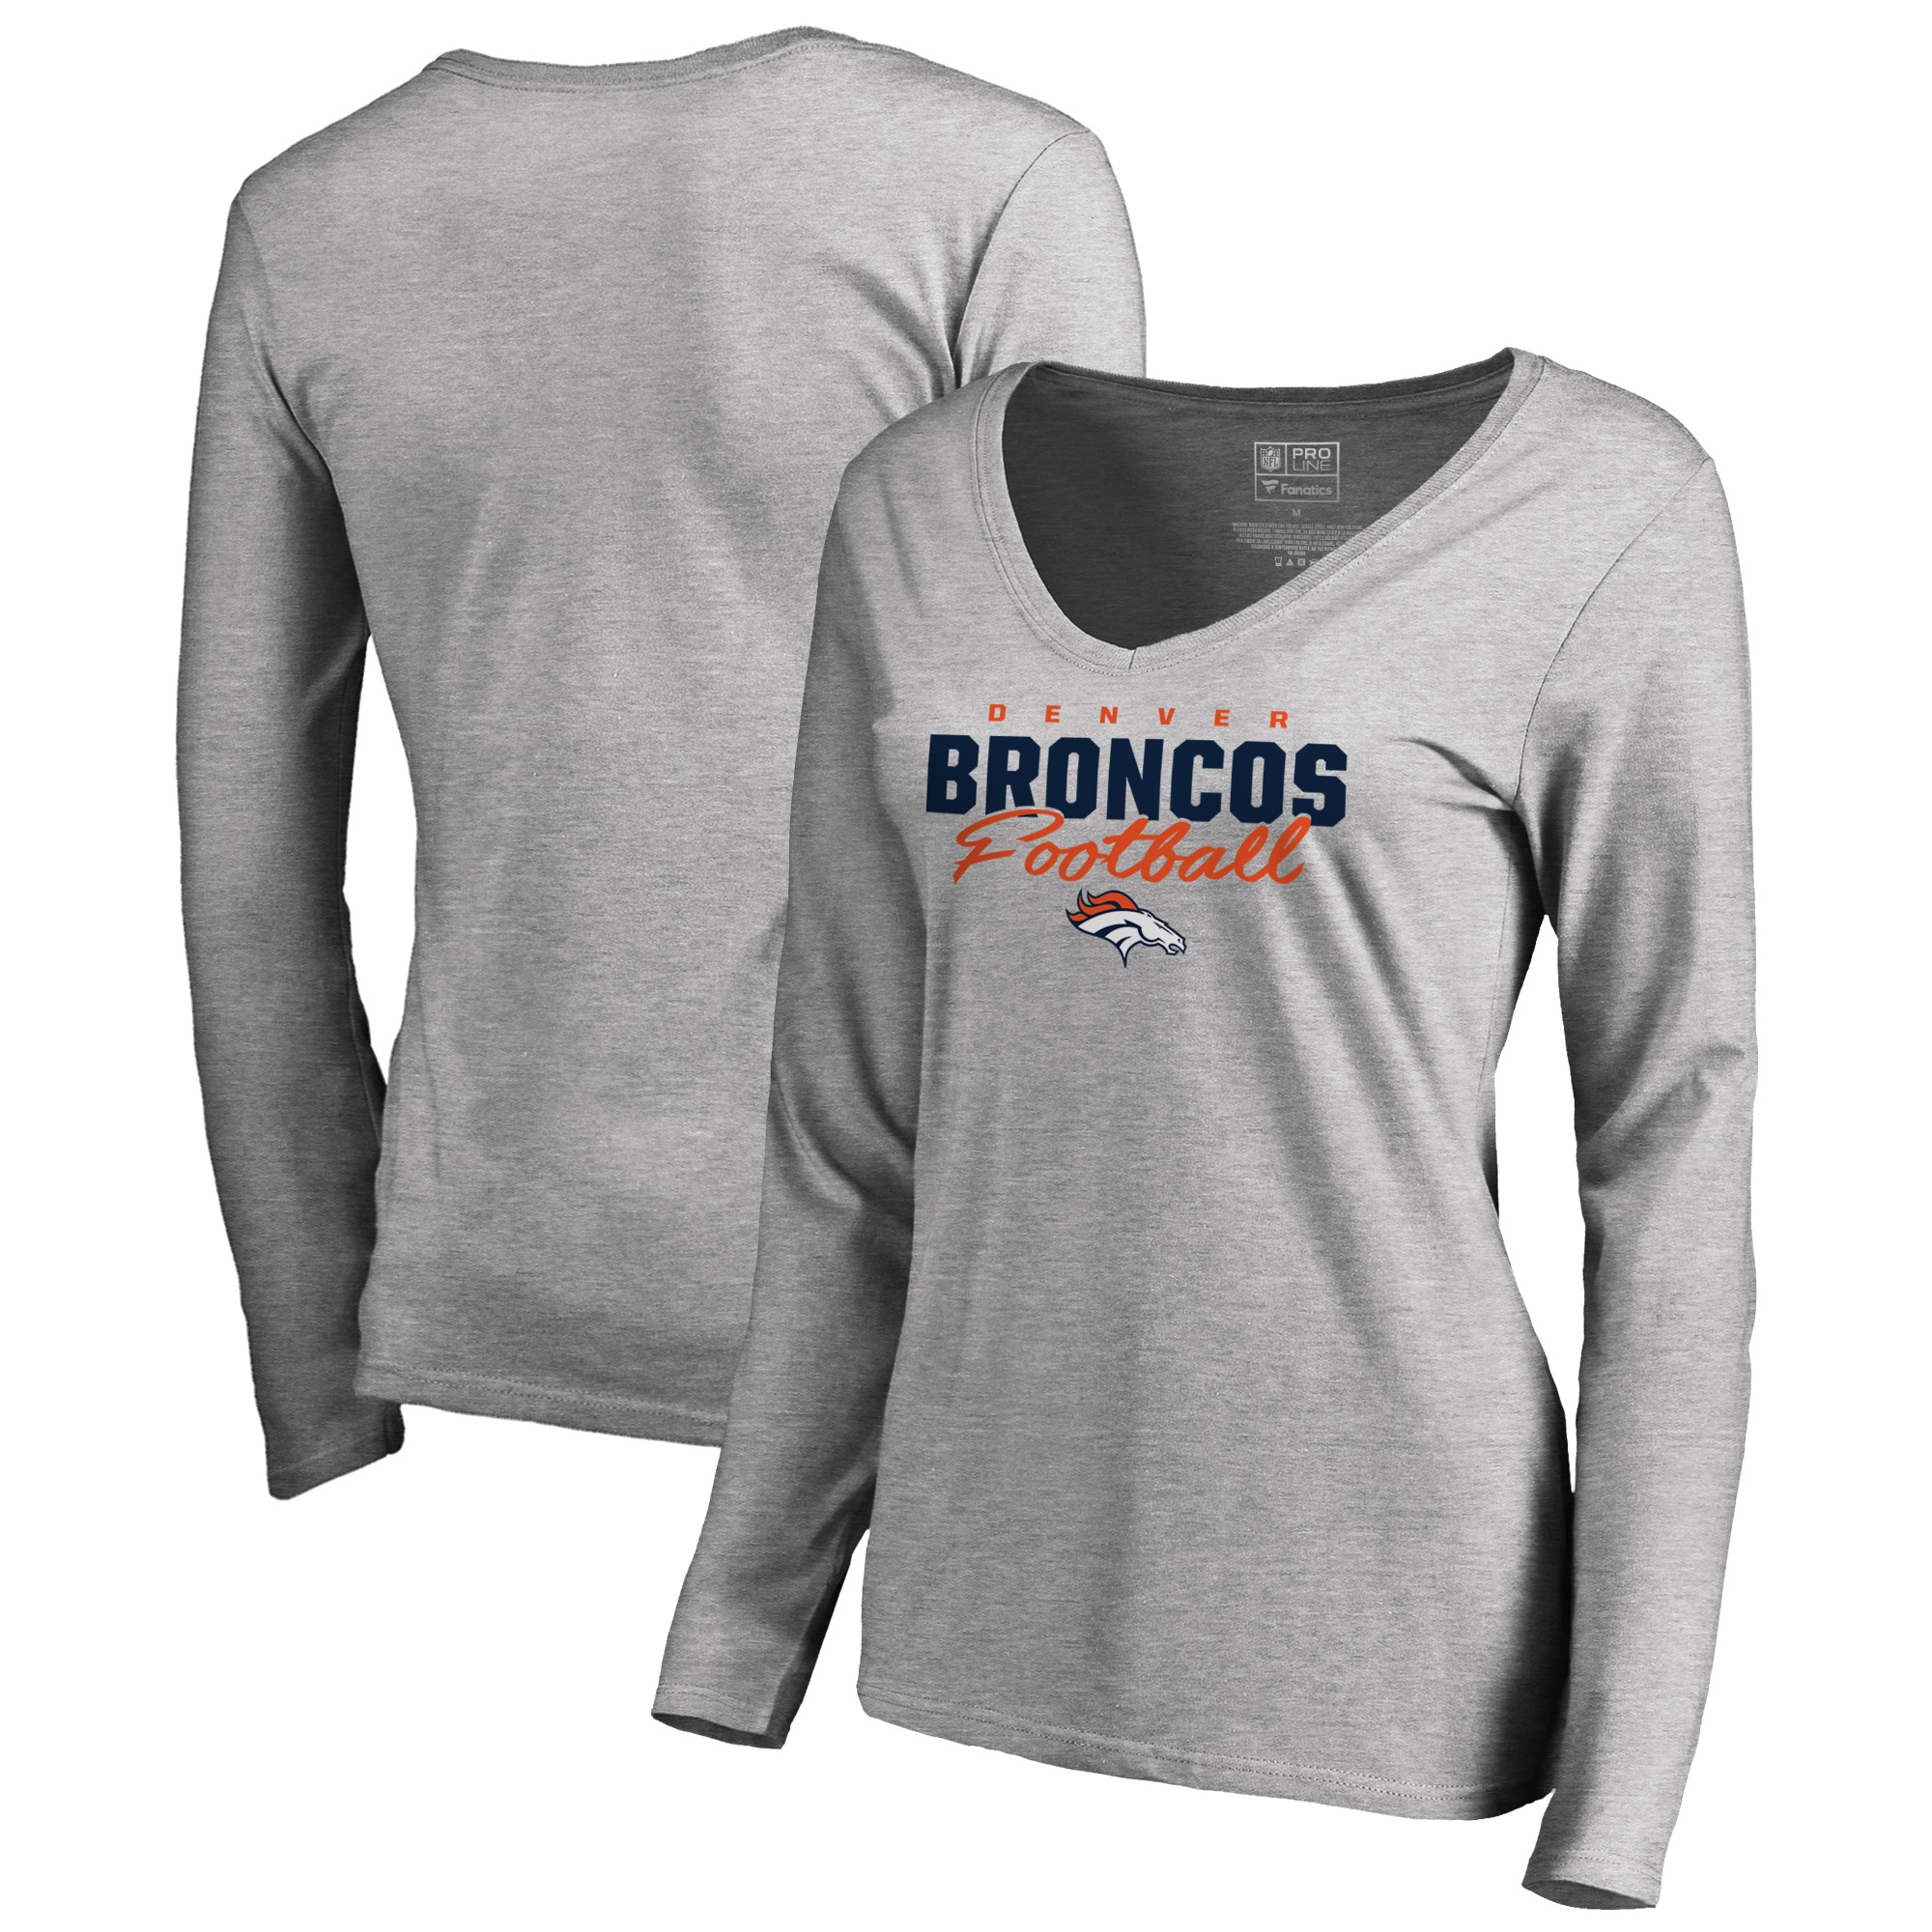 Denver Broncos NFL Pro Line by Fanatics Branded Women's Iconic Collection Script Assist Long Sleeve V-Neck T-Shirt - Ash